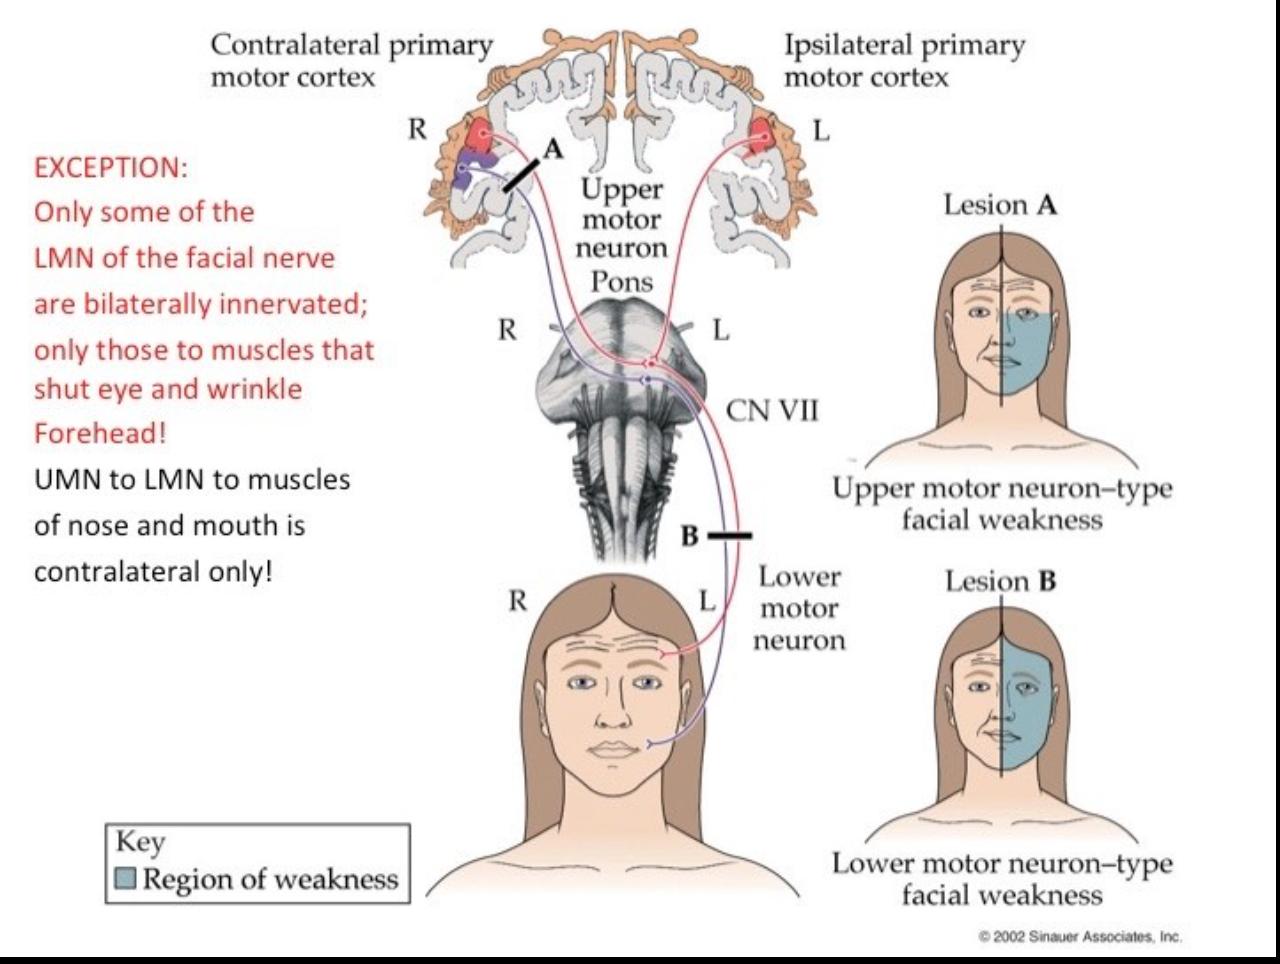 Upper Motor Neuron 7th Nerve Palsy Impremedia Net